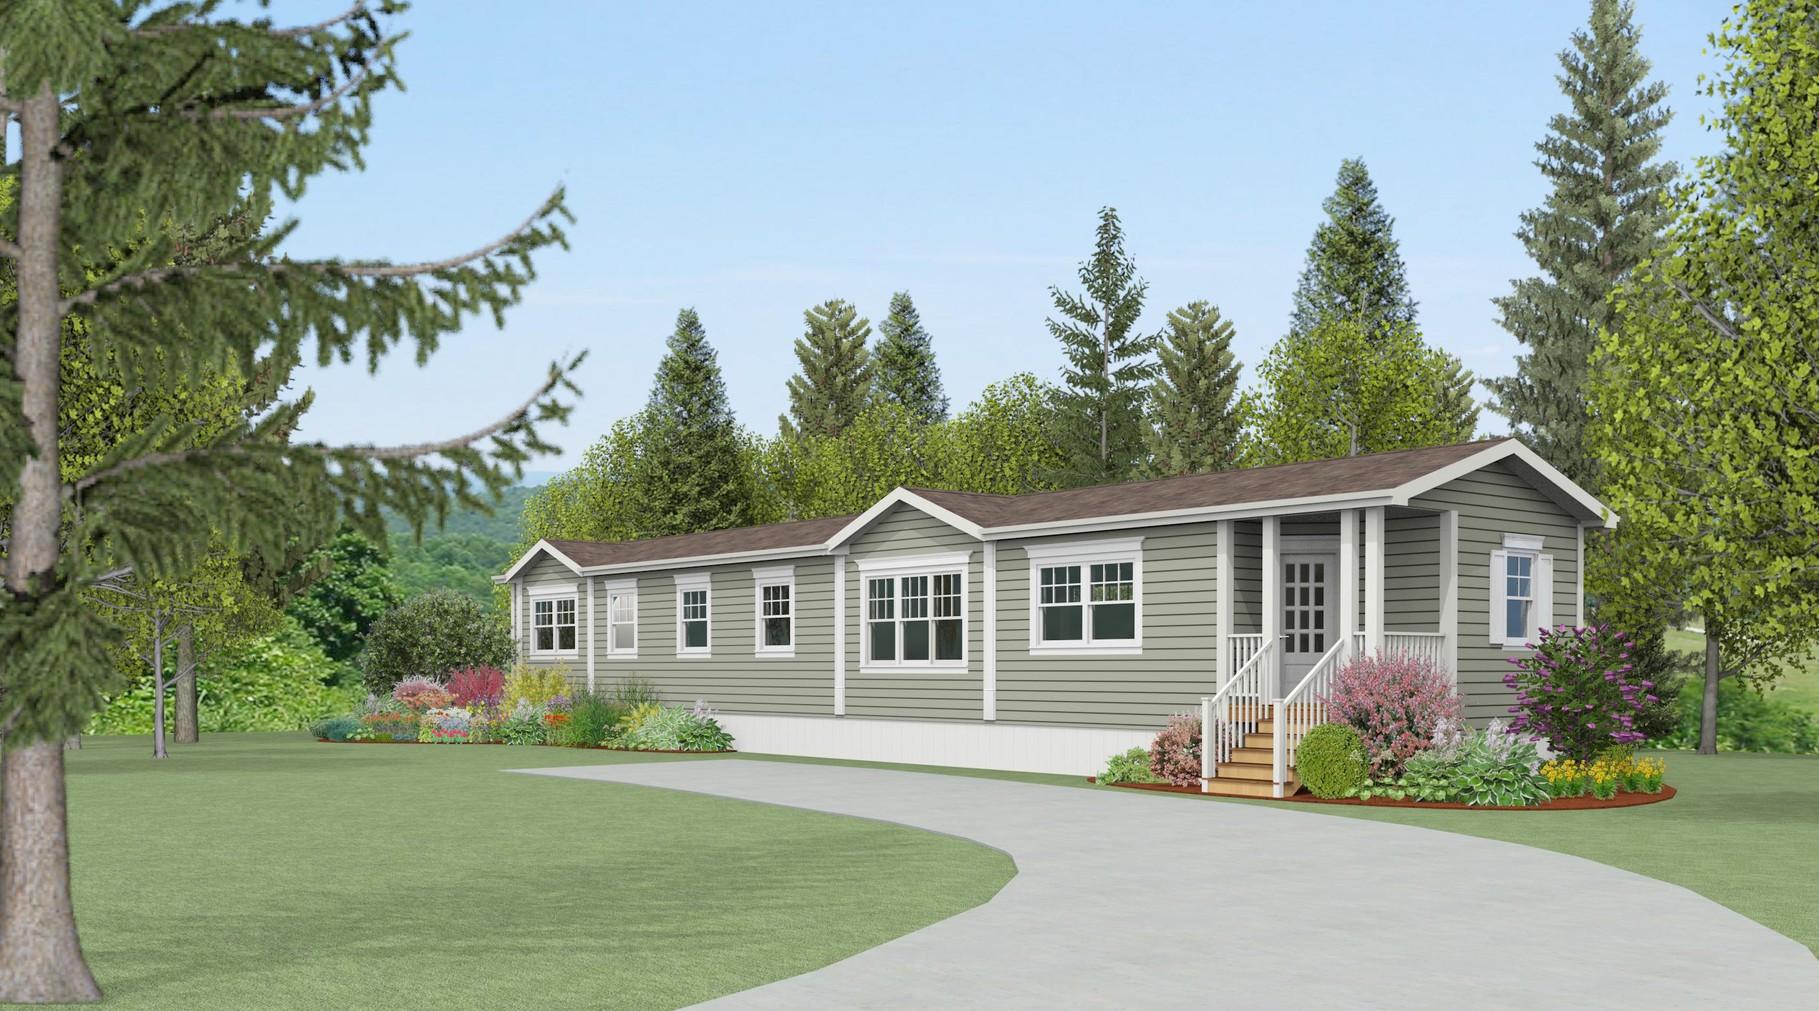 Model homes to view in both Truro & Antigonish